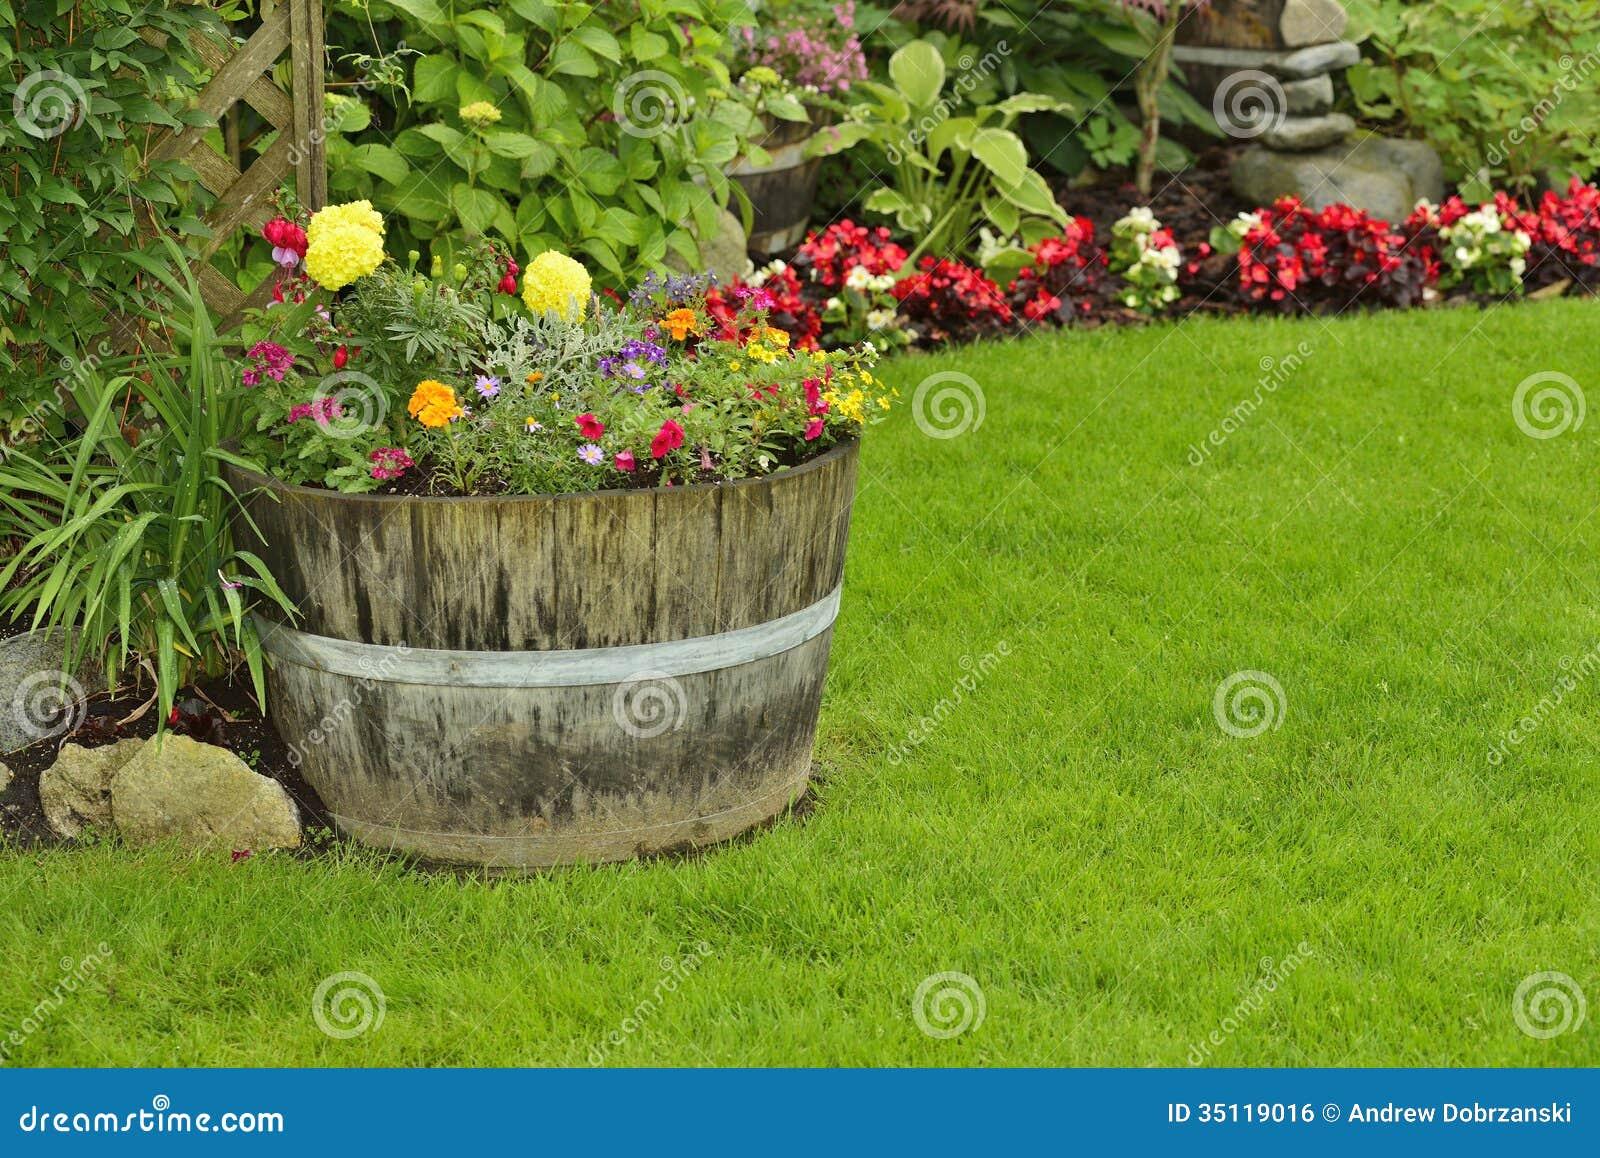 Garden flowers royalty free stock image image 35119016 for Garden arrangement of plants